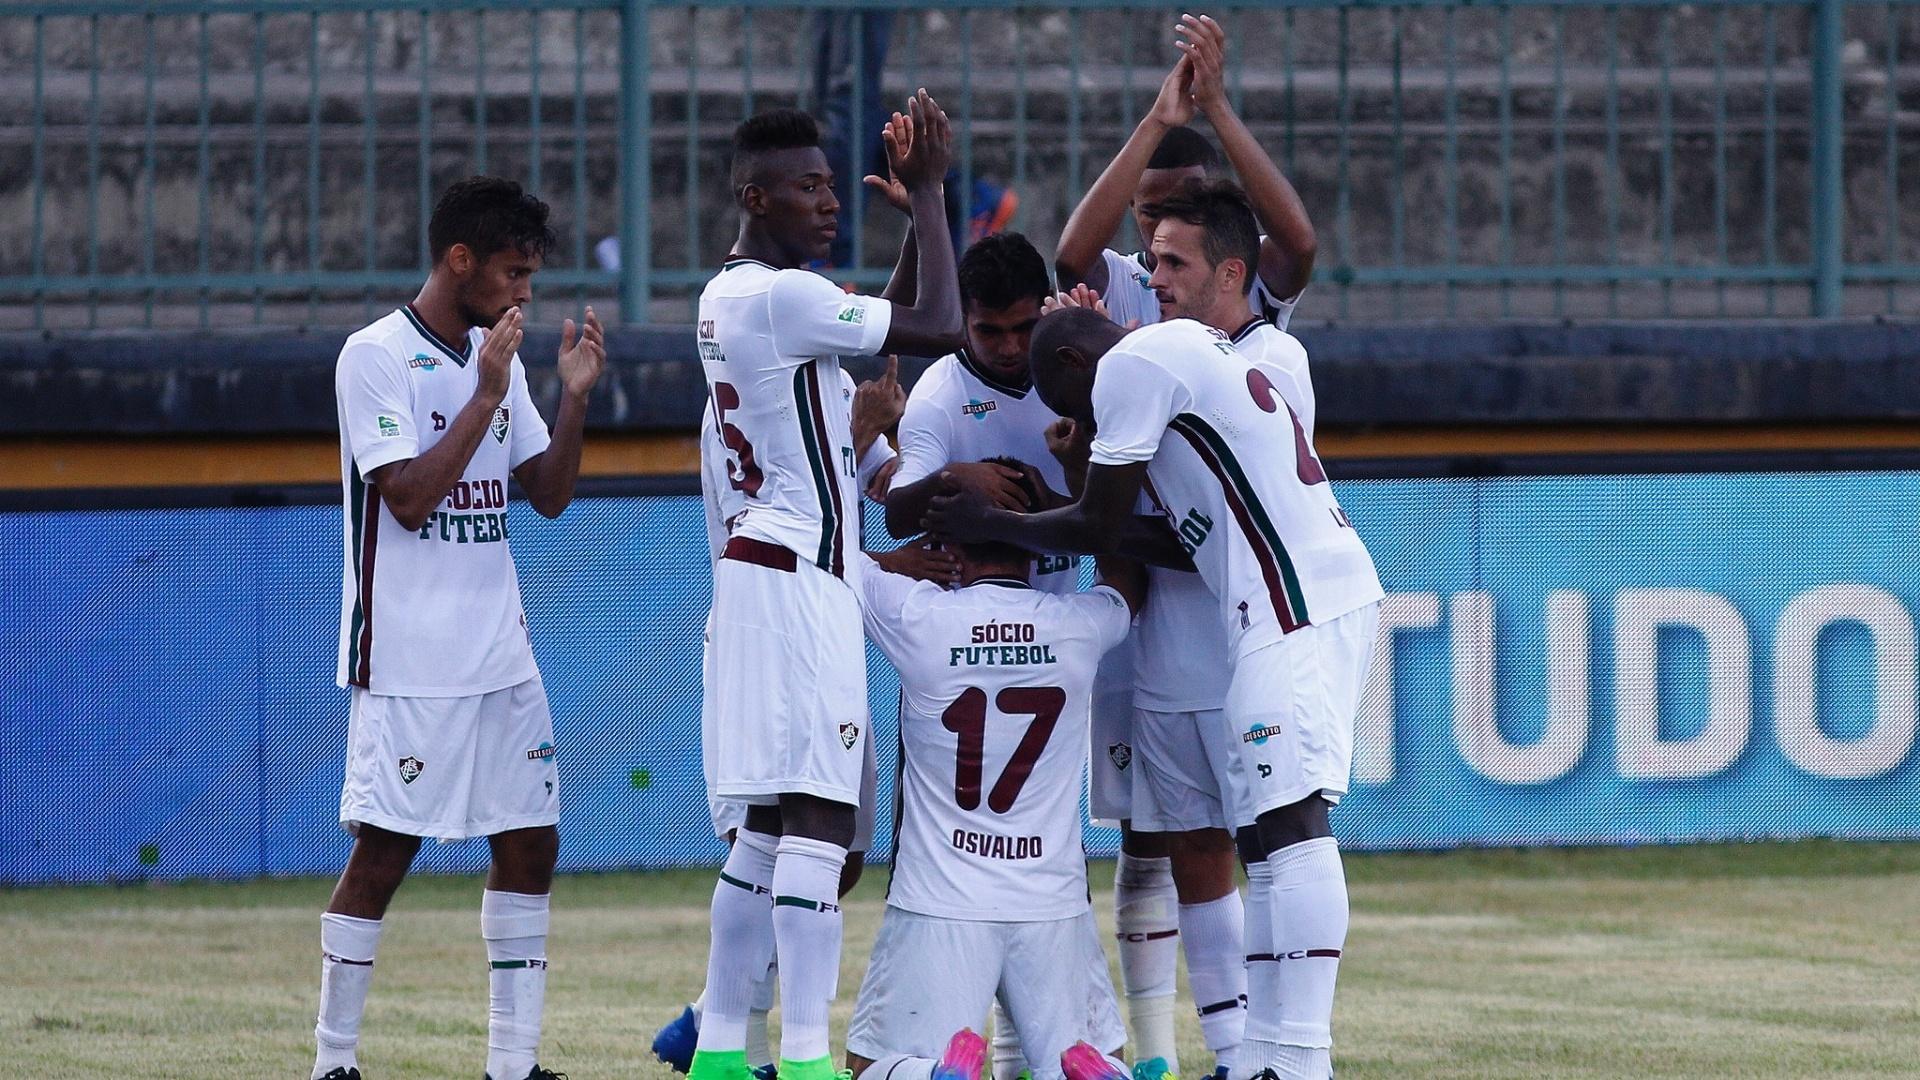 Jogadores do Fluminense comemoram gol de Osvaldo